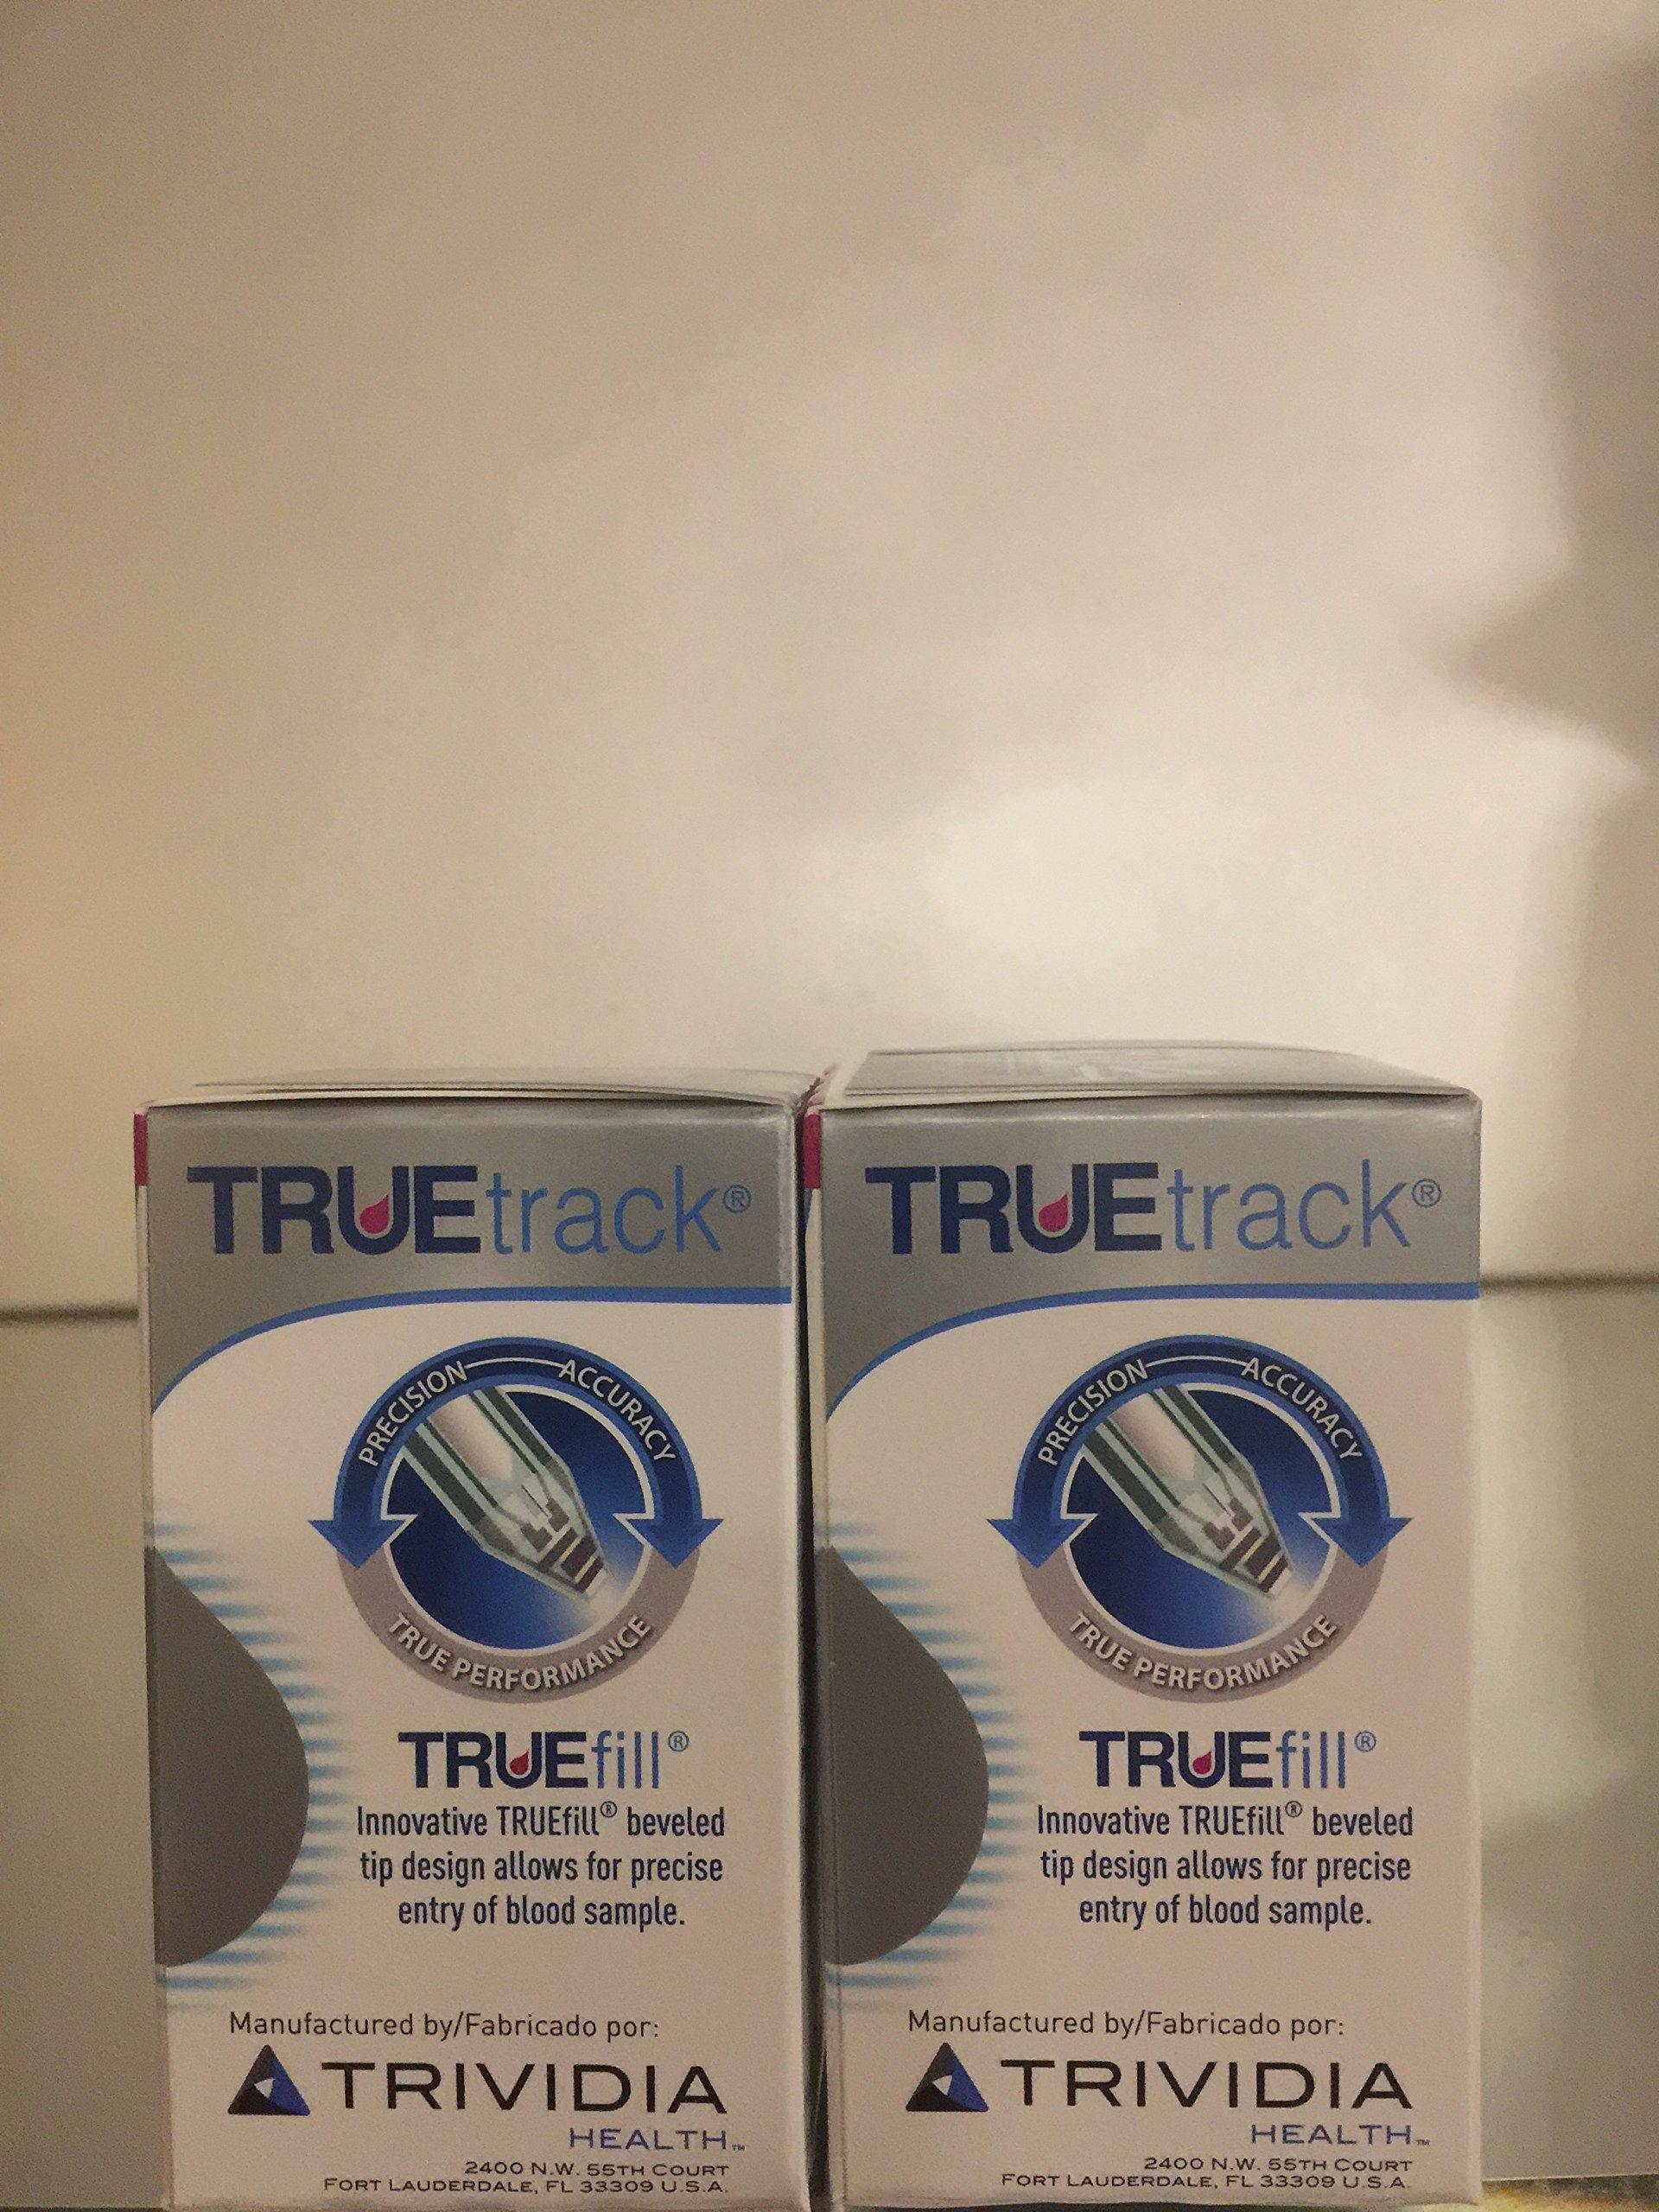 TRUEtrack Blood Glucose Test Strips(100 Count)